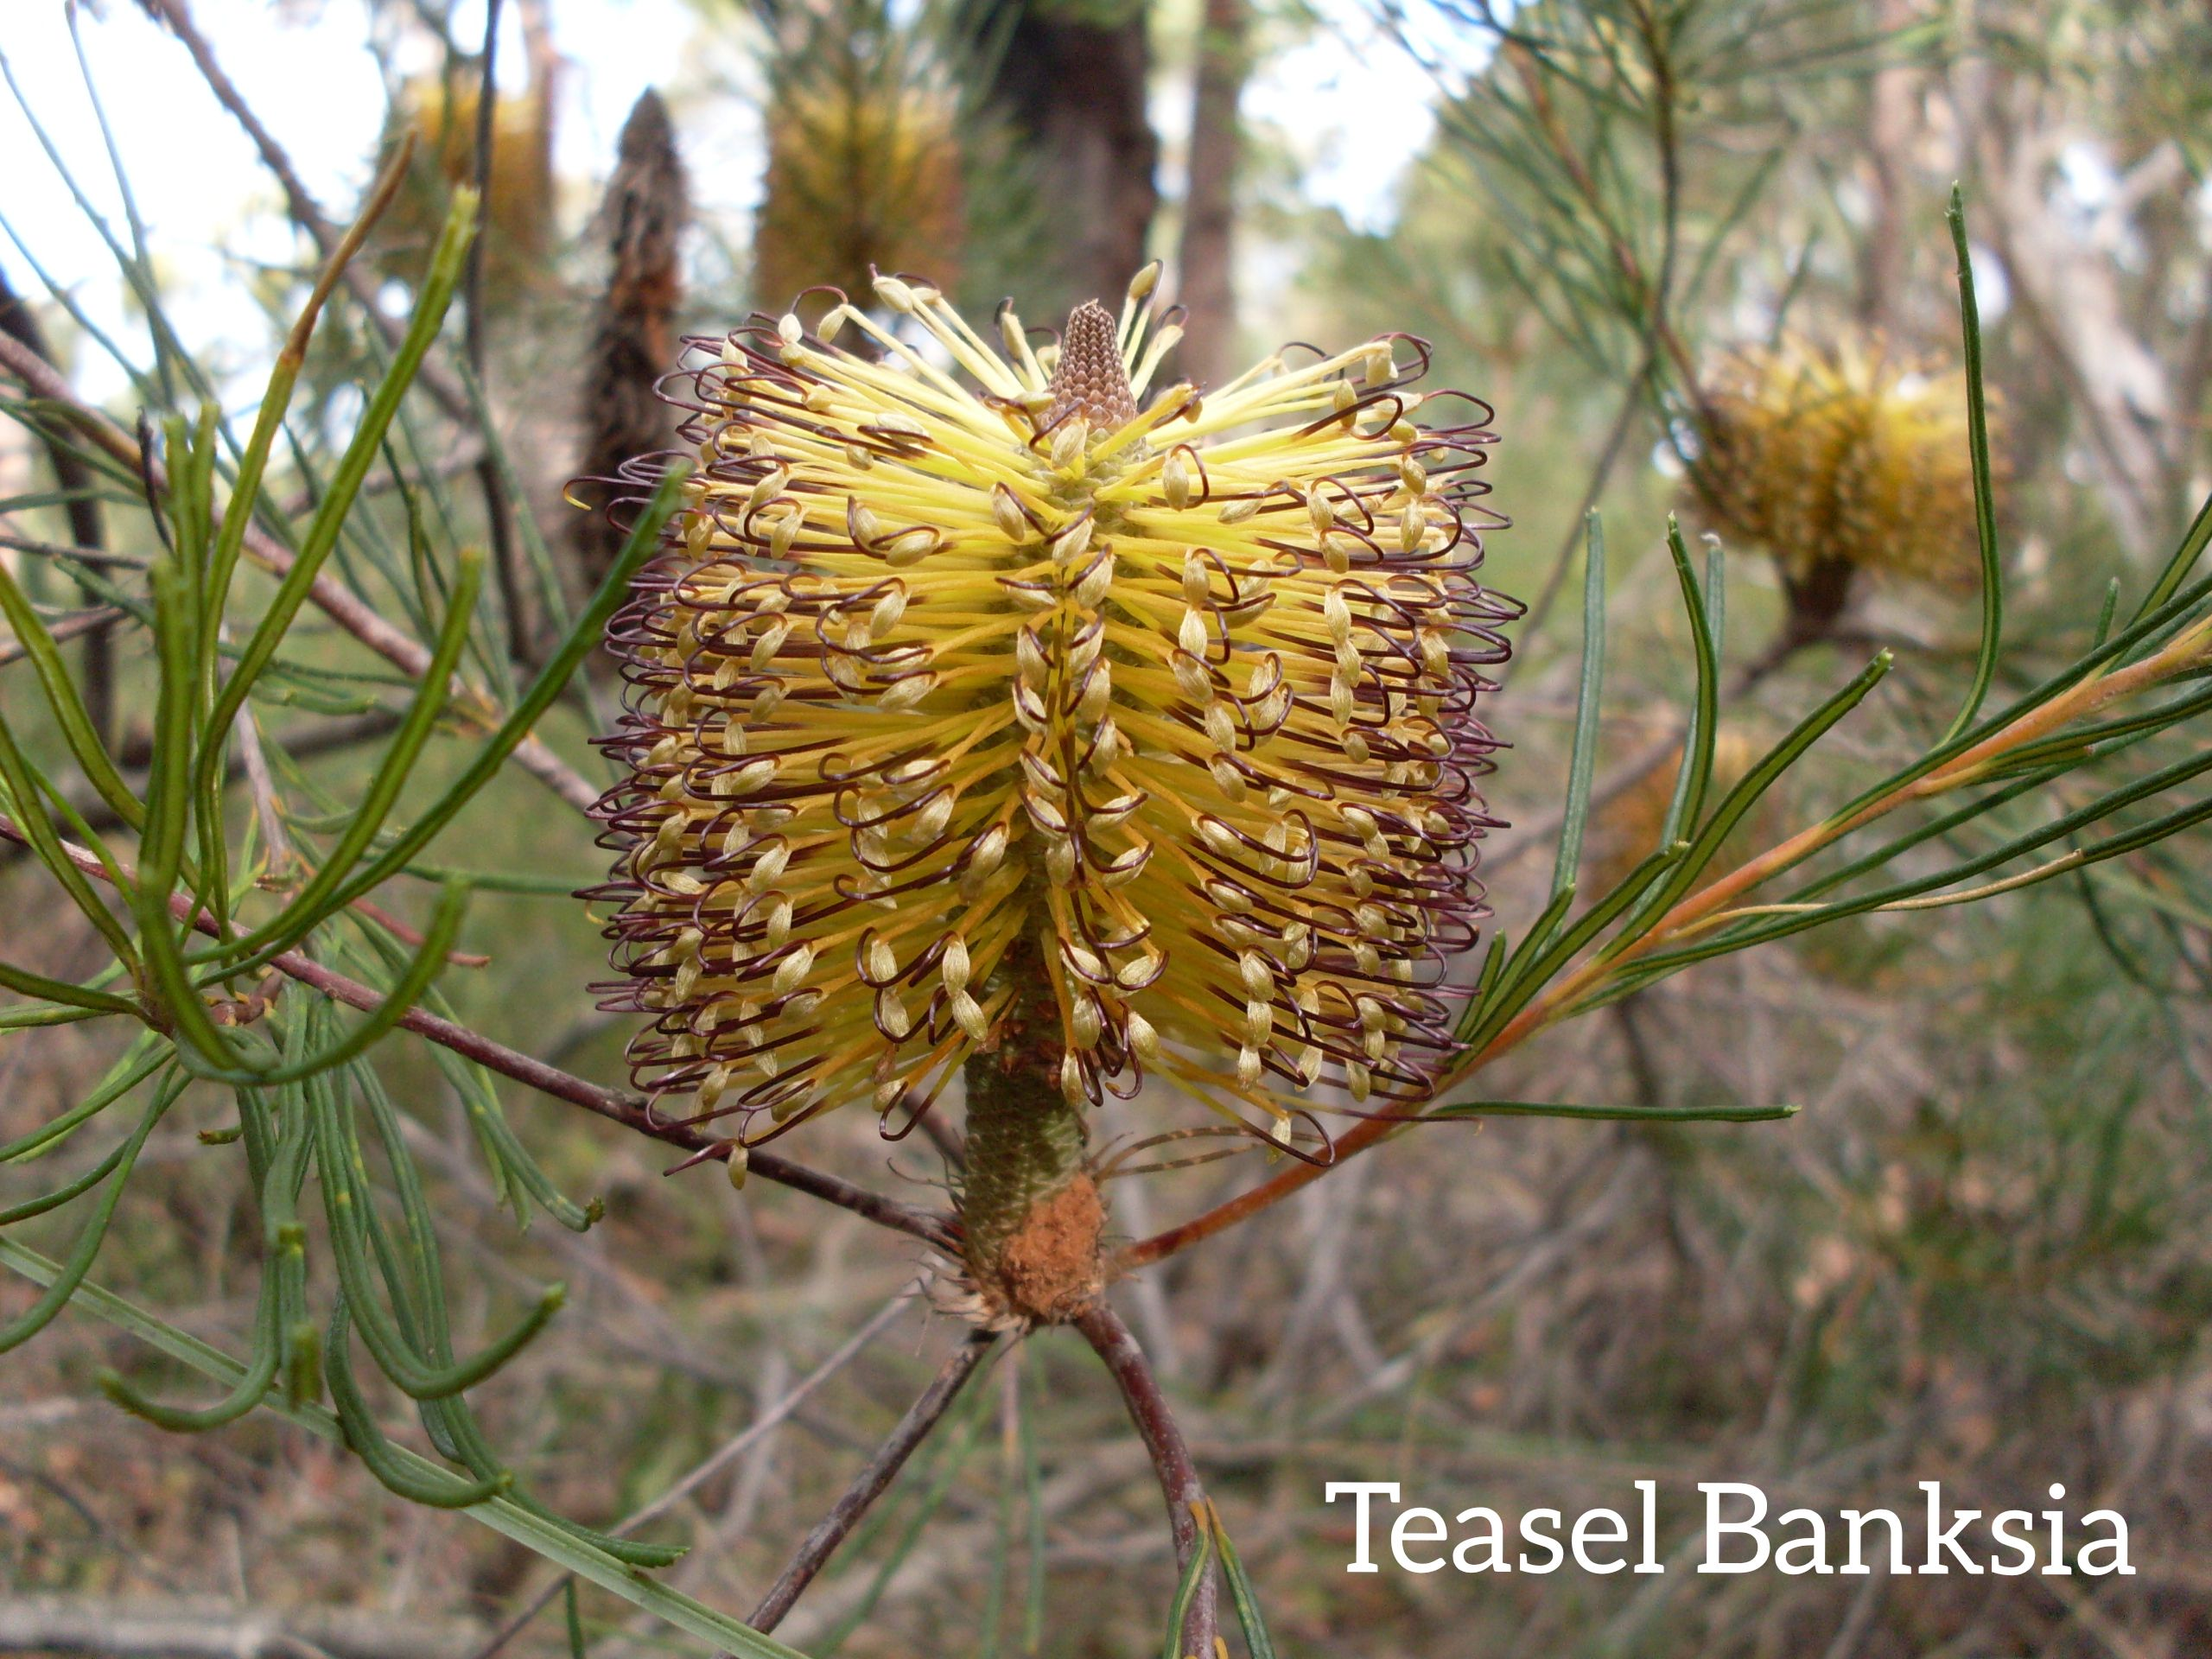 Teasel Banksia